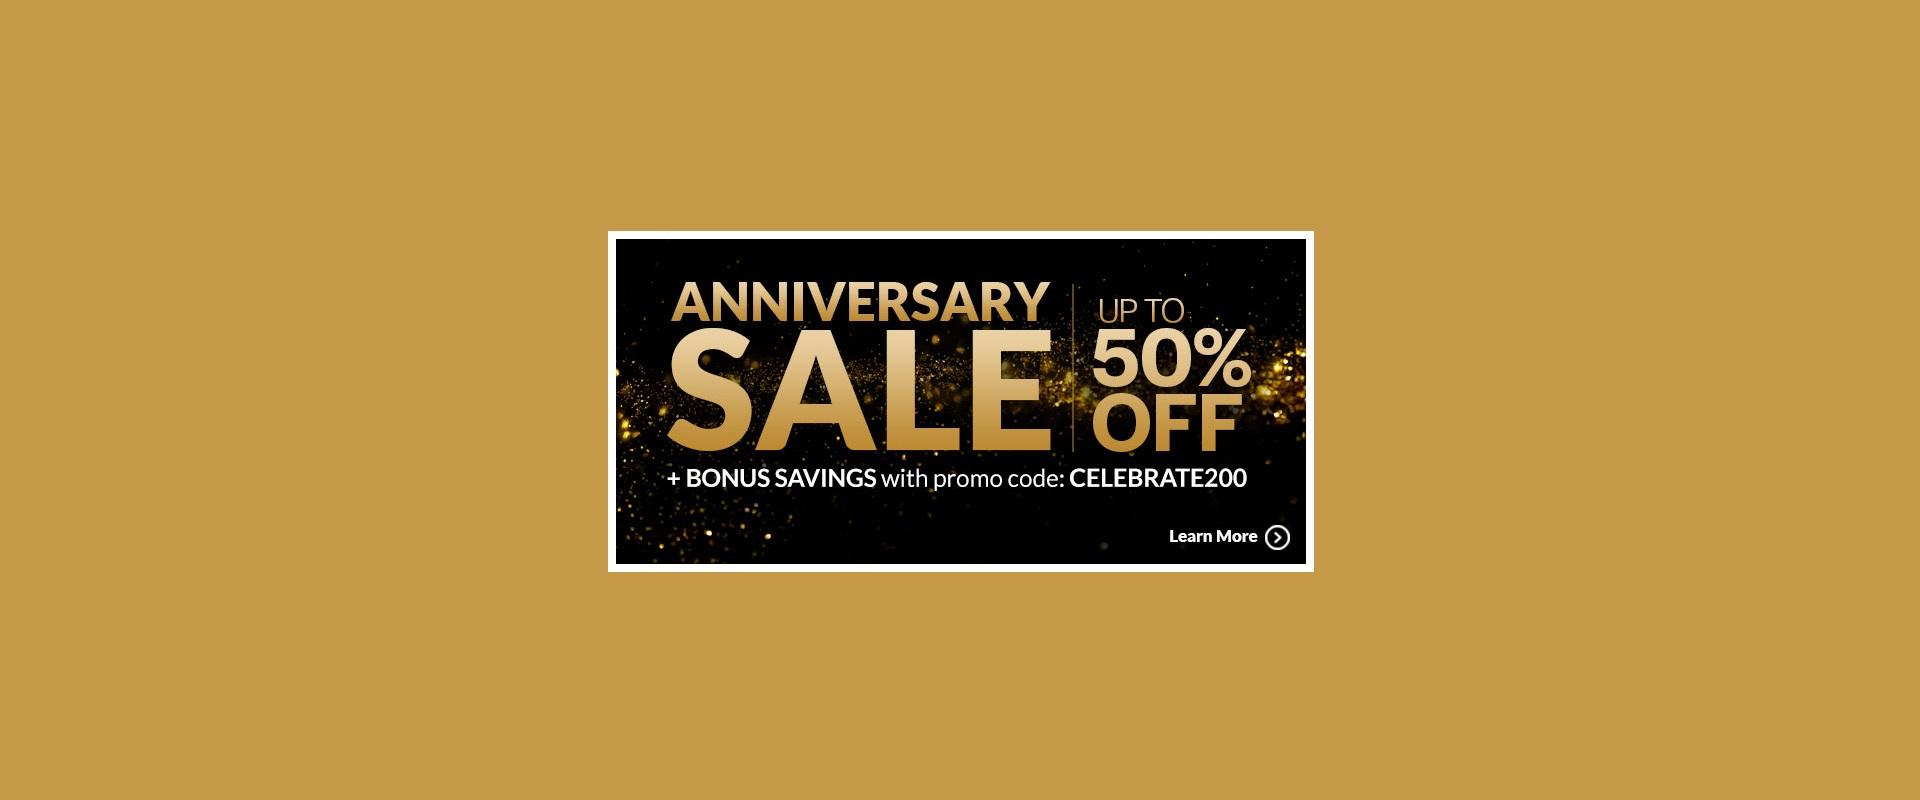 Anniversary-Sale-Banner